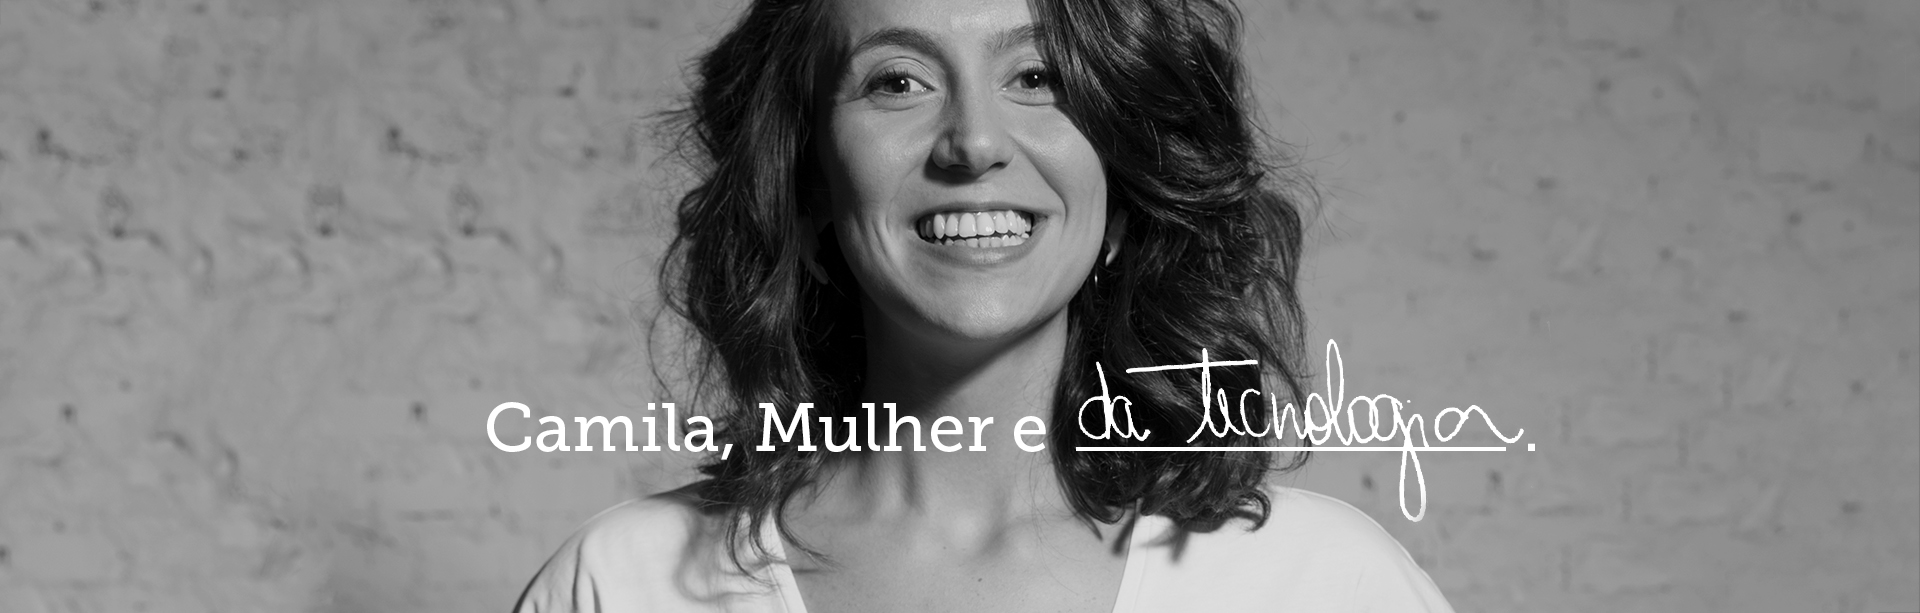 Camila Achutti